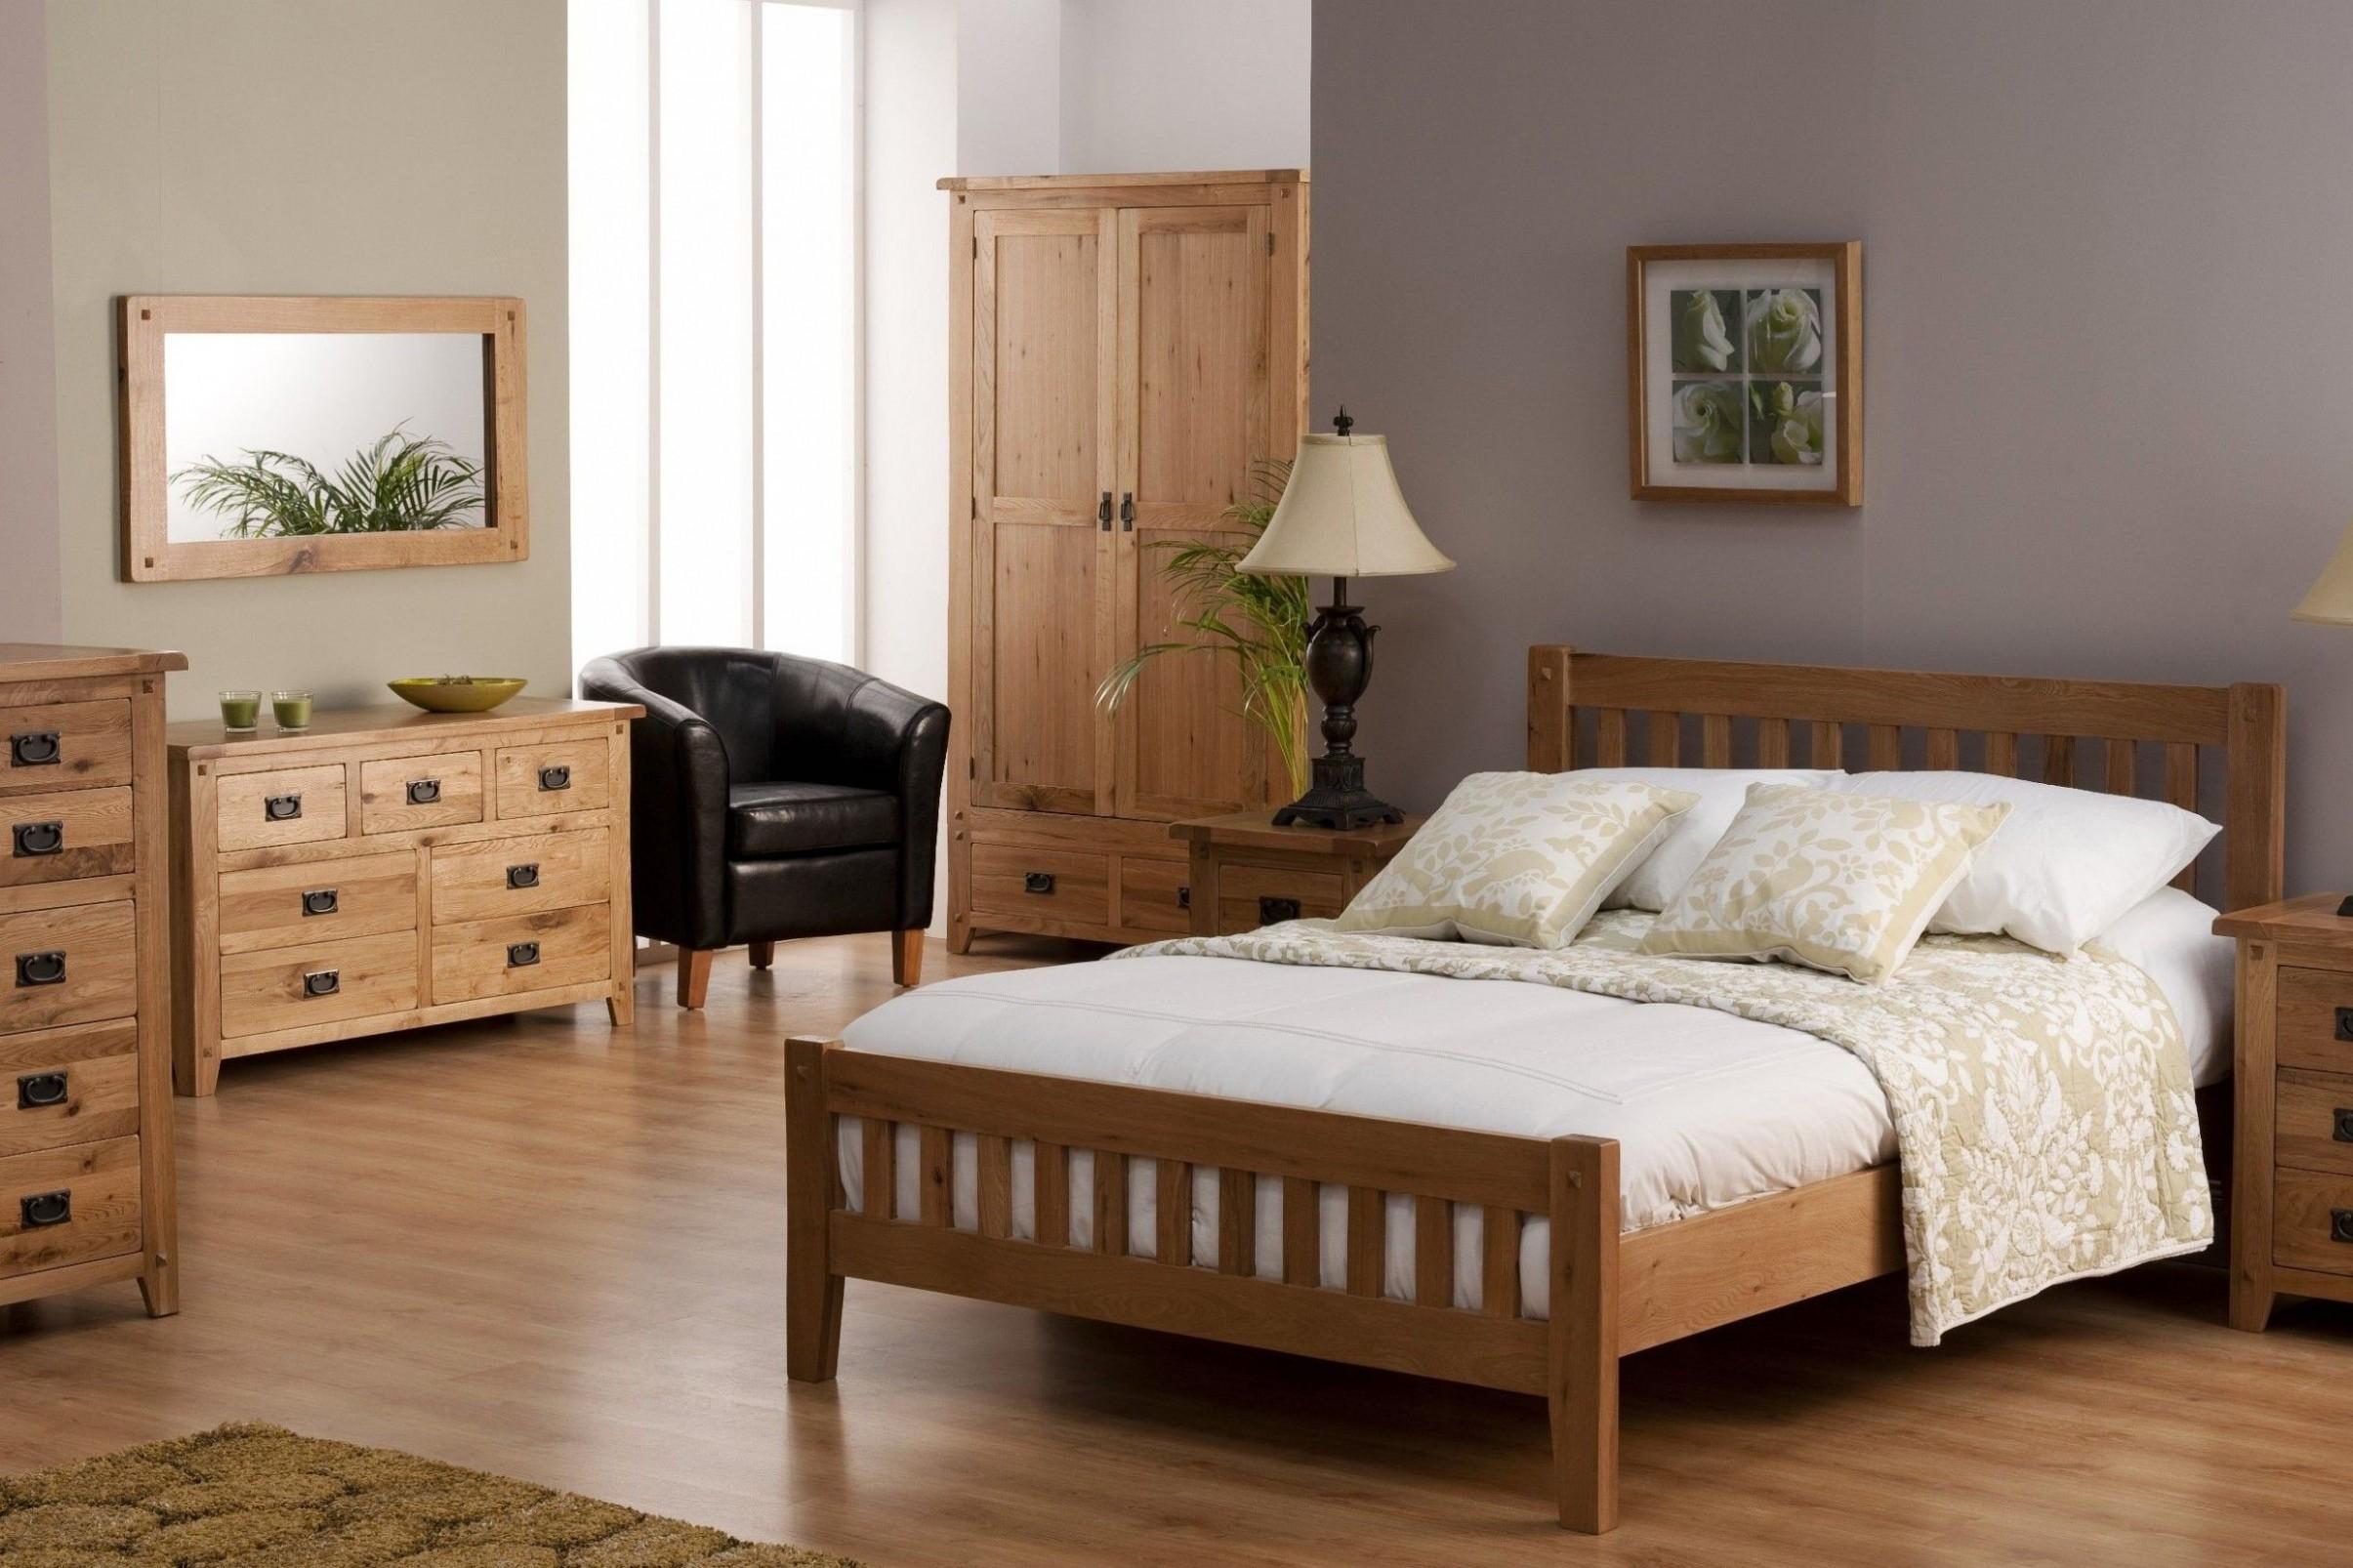 Bedroom Decorating Ideas Oak Furniture di 10 - Bedroom Ideas Oak Furniture